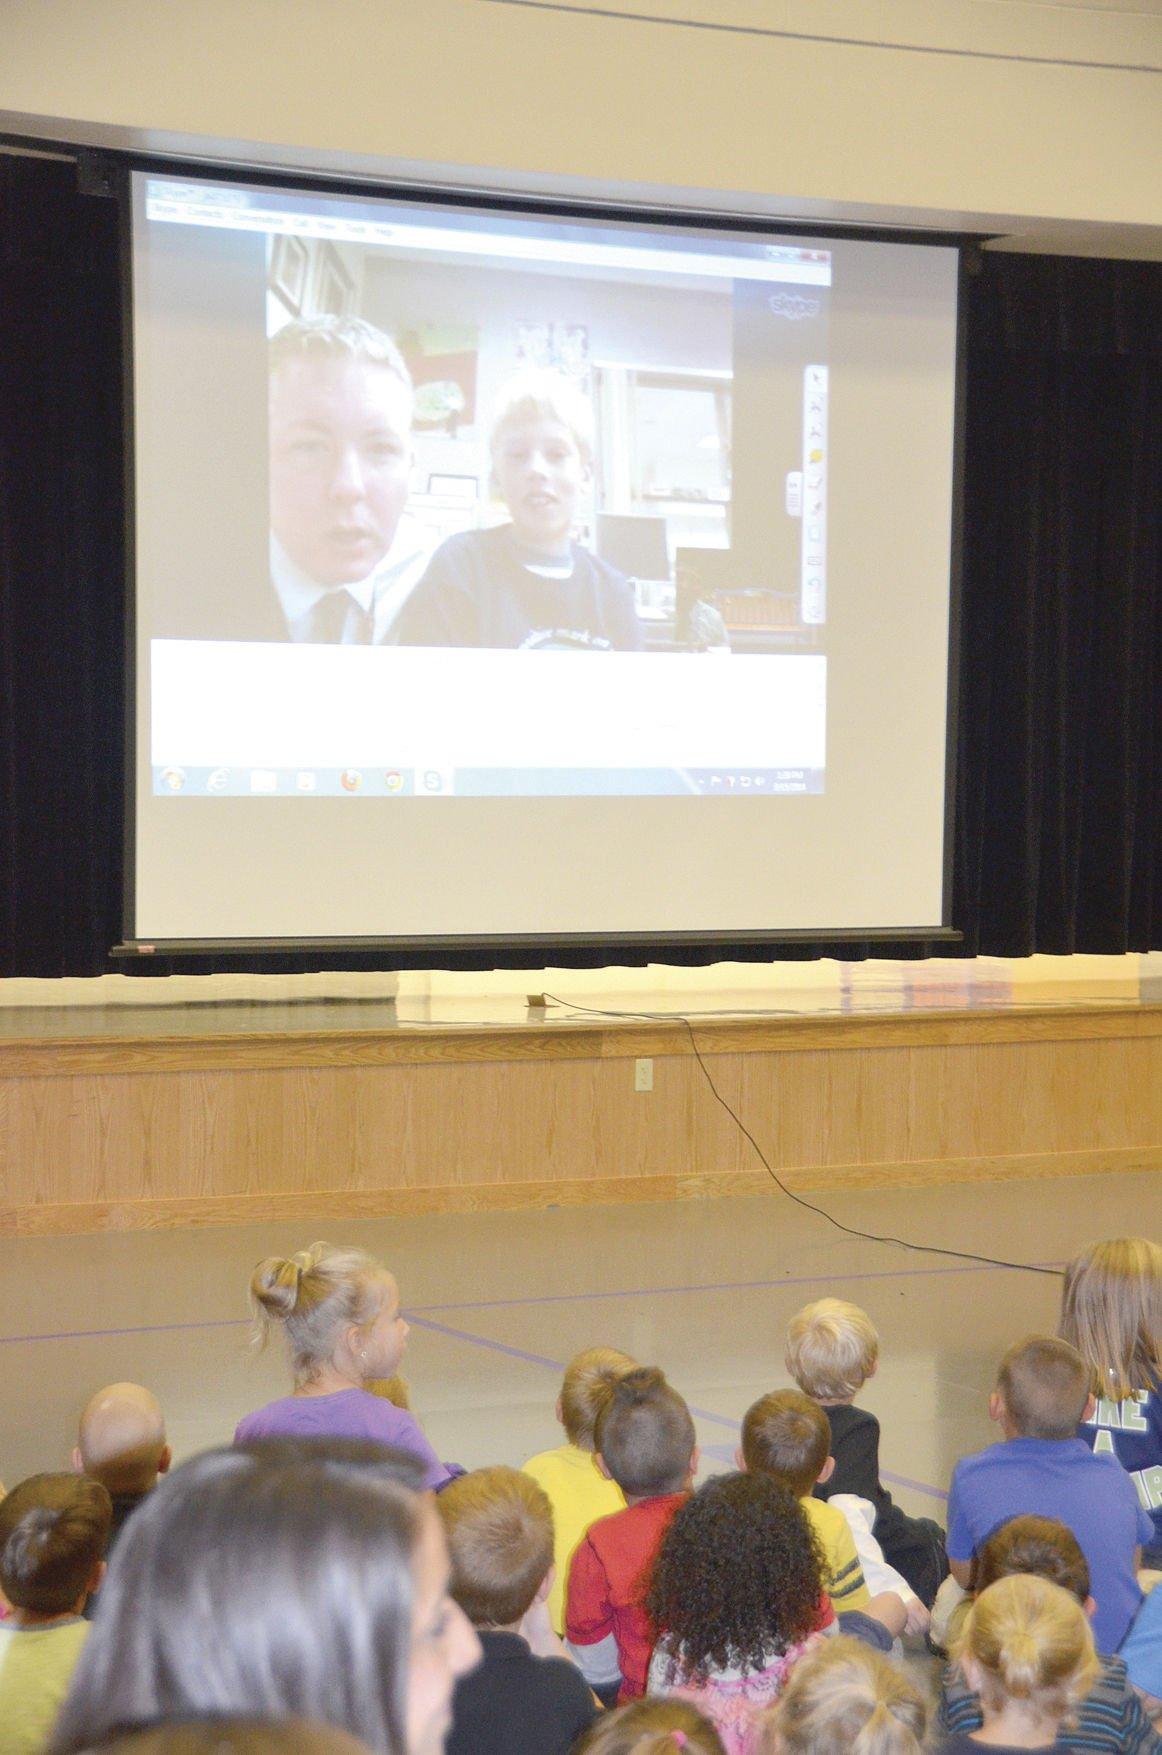 Danville Middle School dedicates Buddy Bench to school friend lost